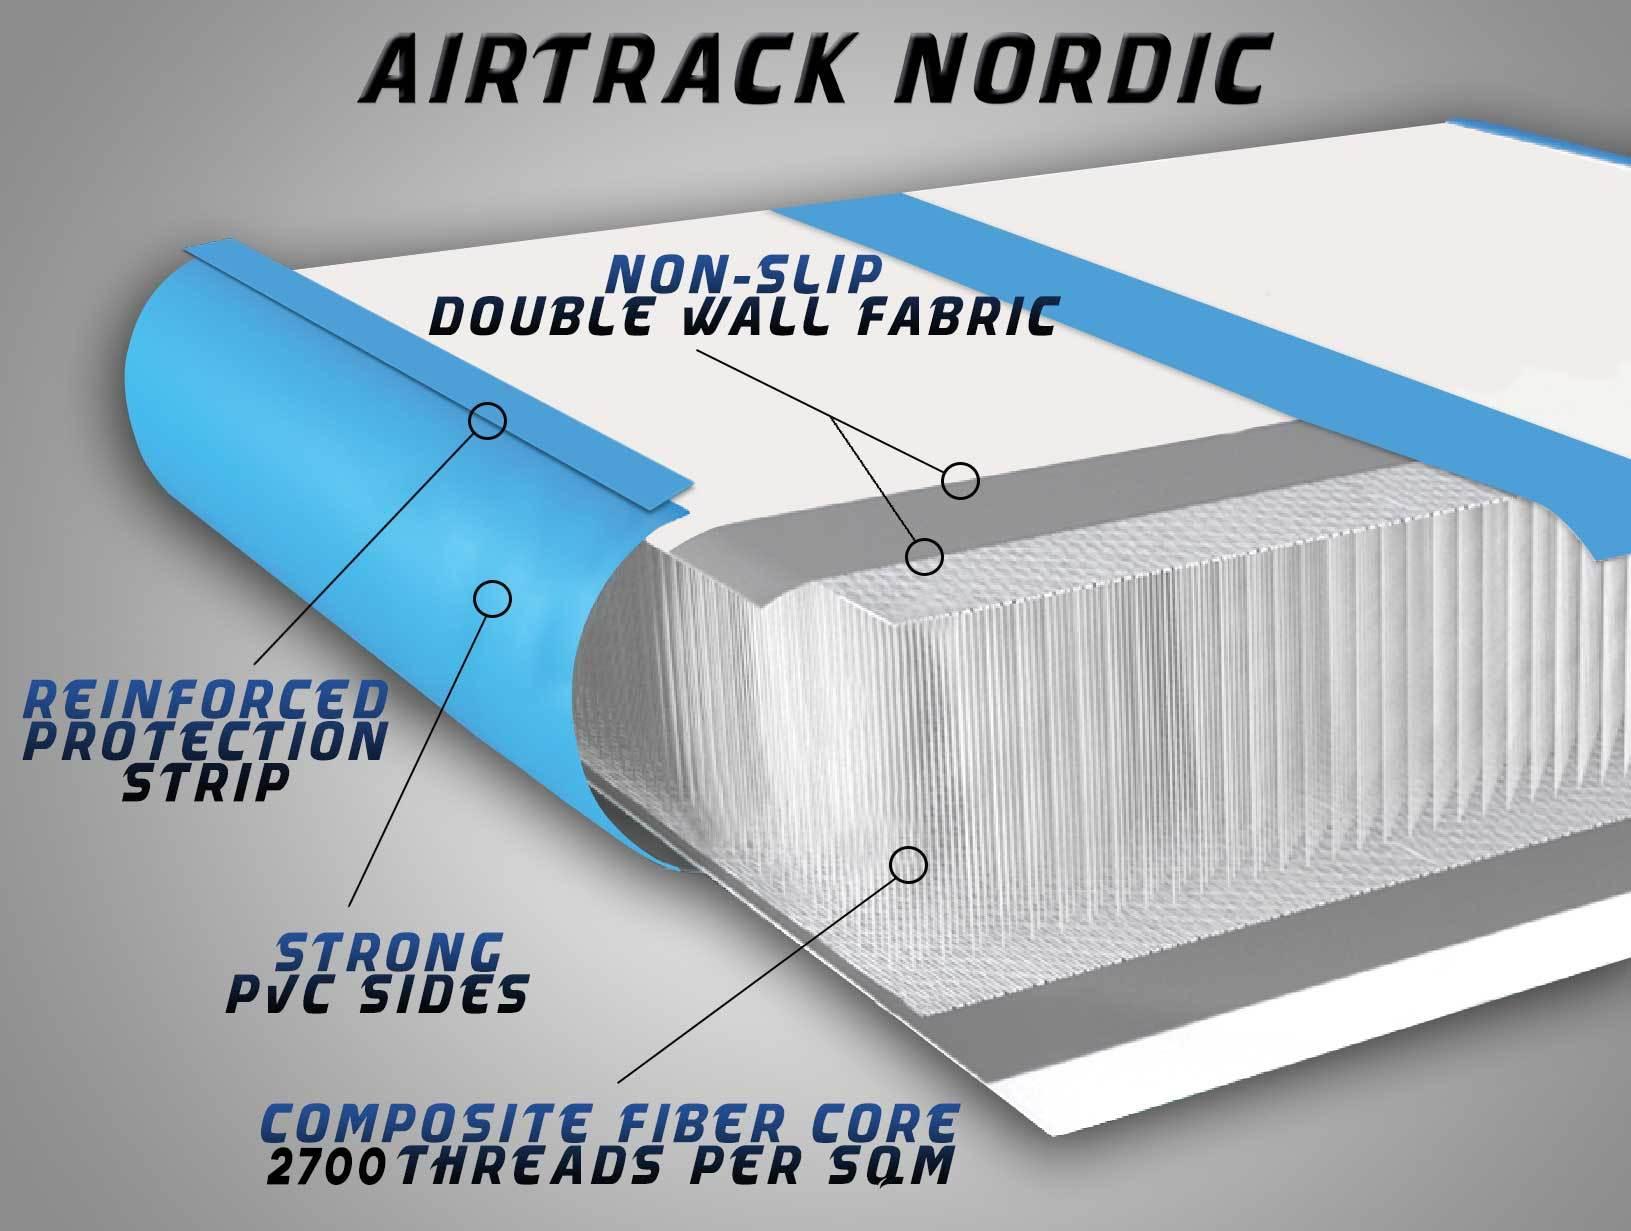 airtrack-nordic-sisakuva-web.jpg